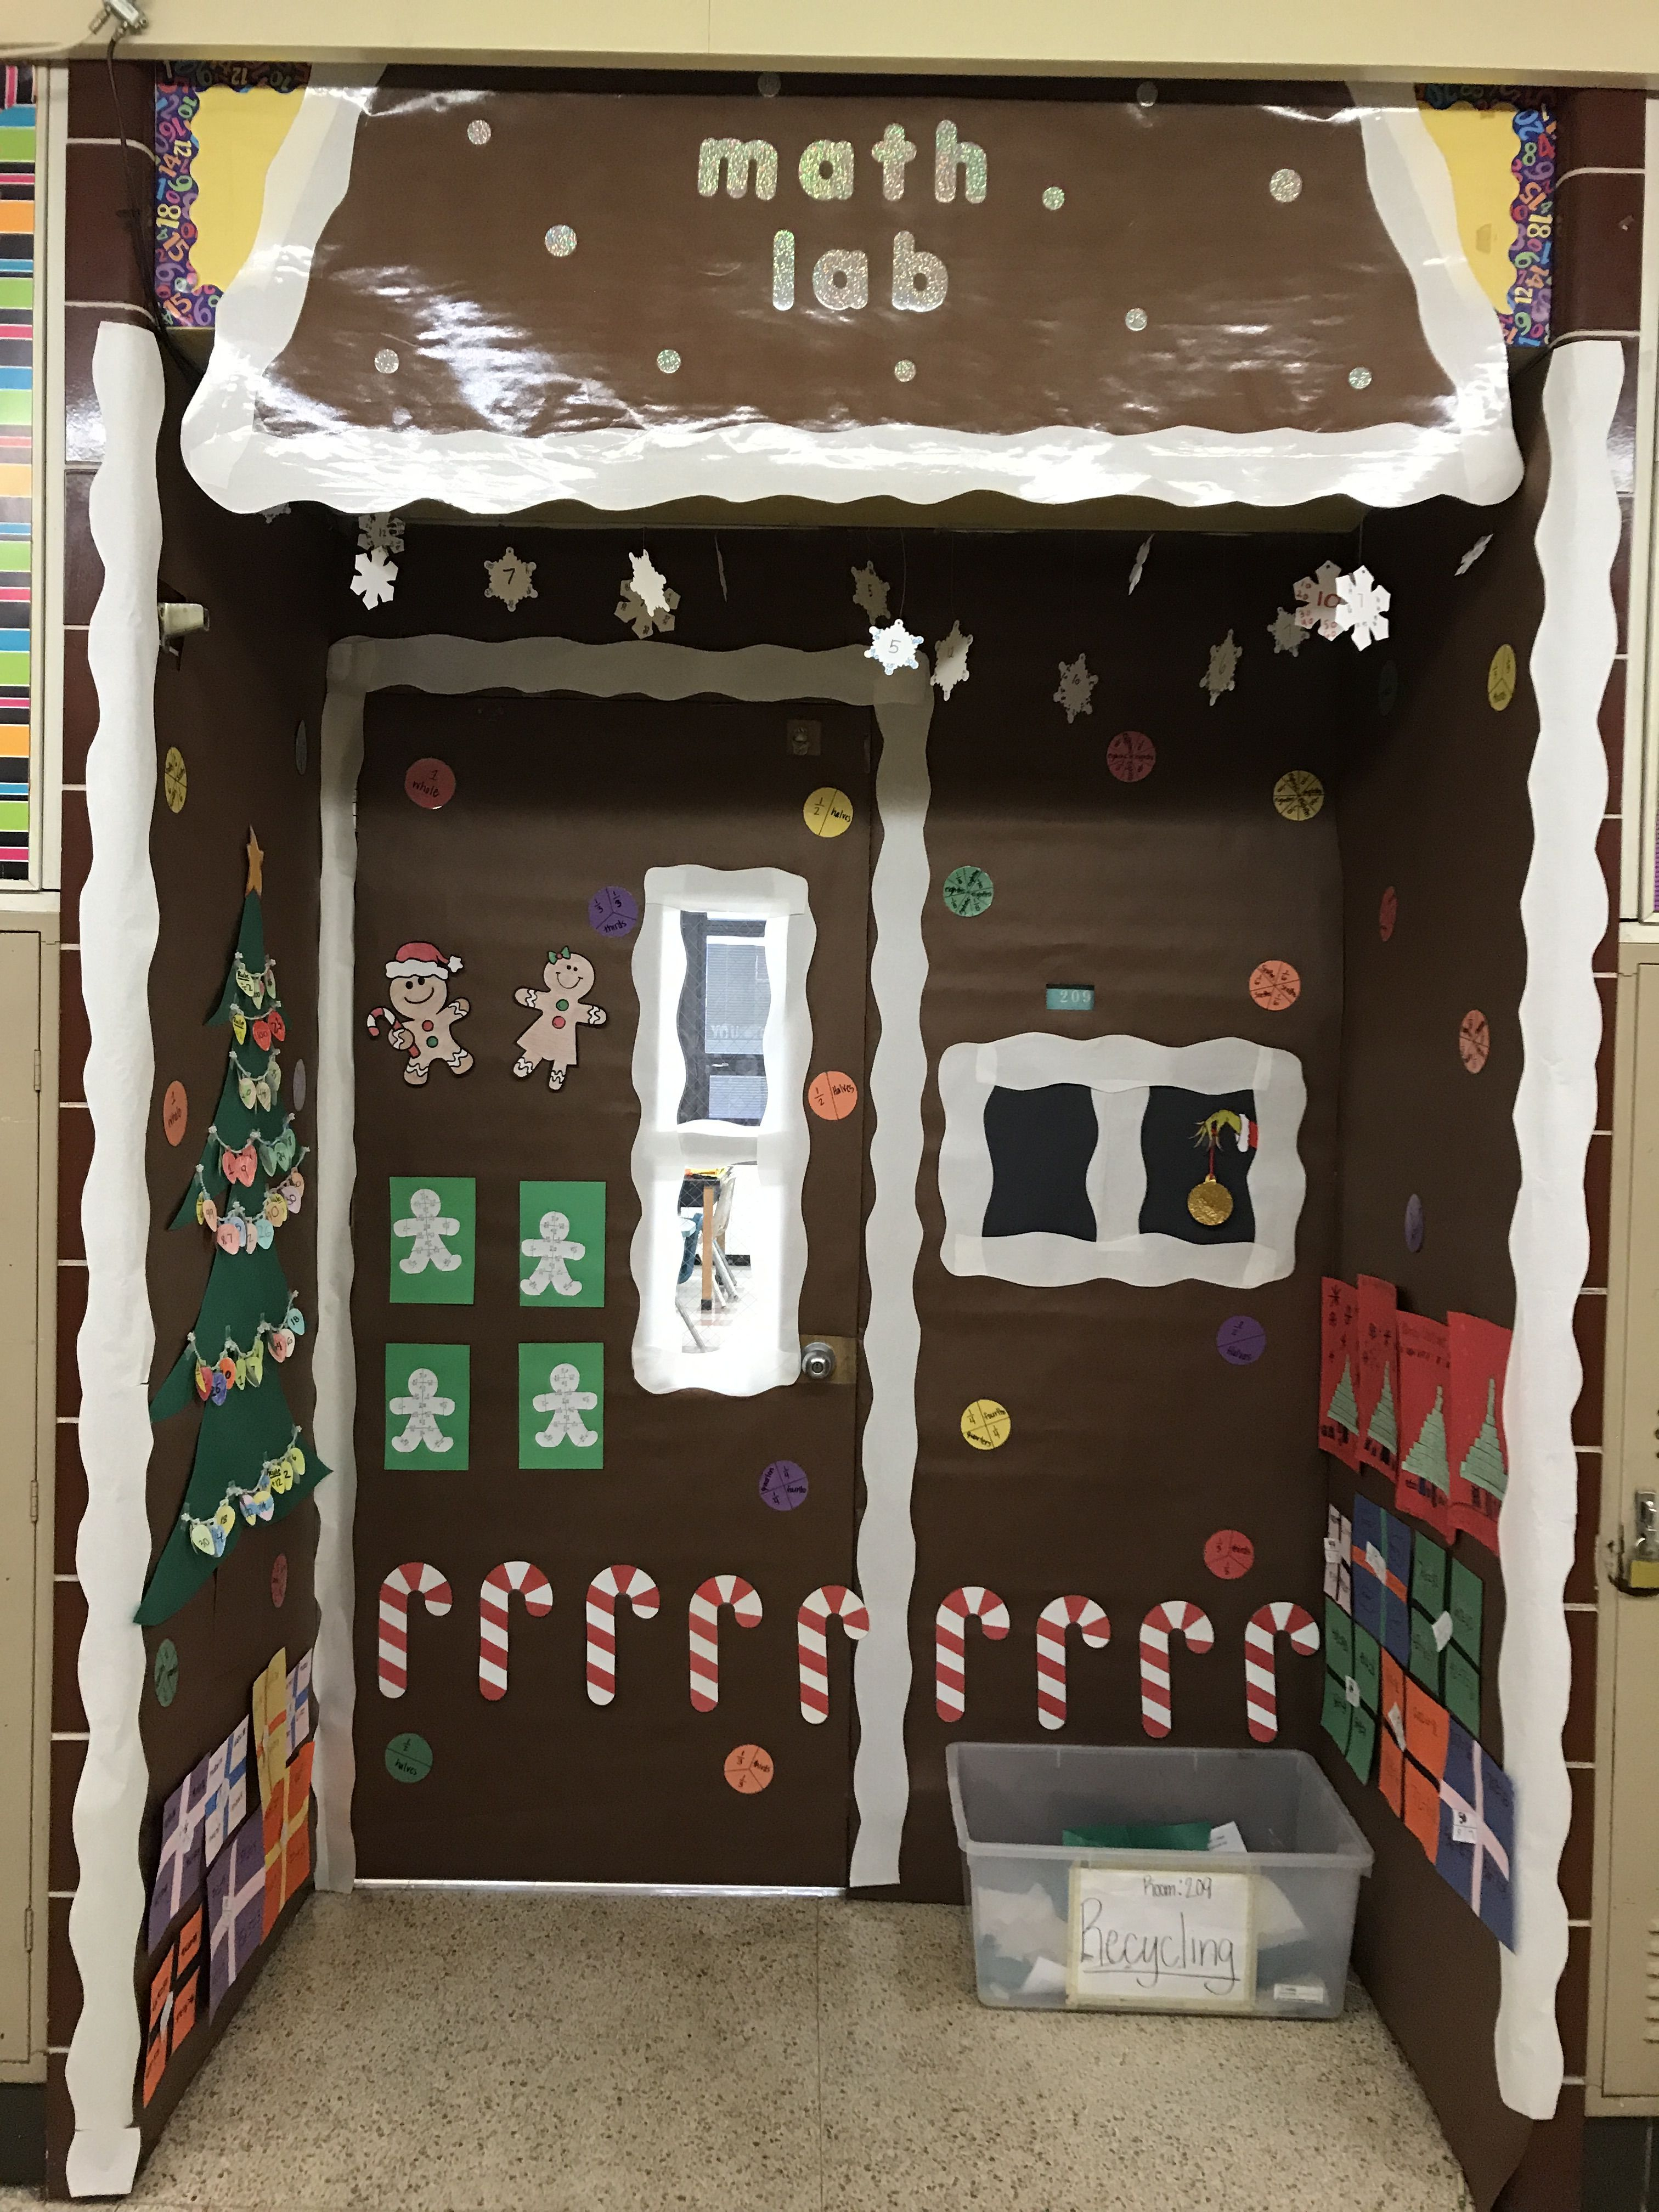 Math Room Gingerbread House Door Math Education